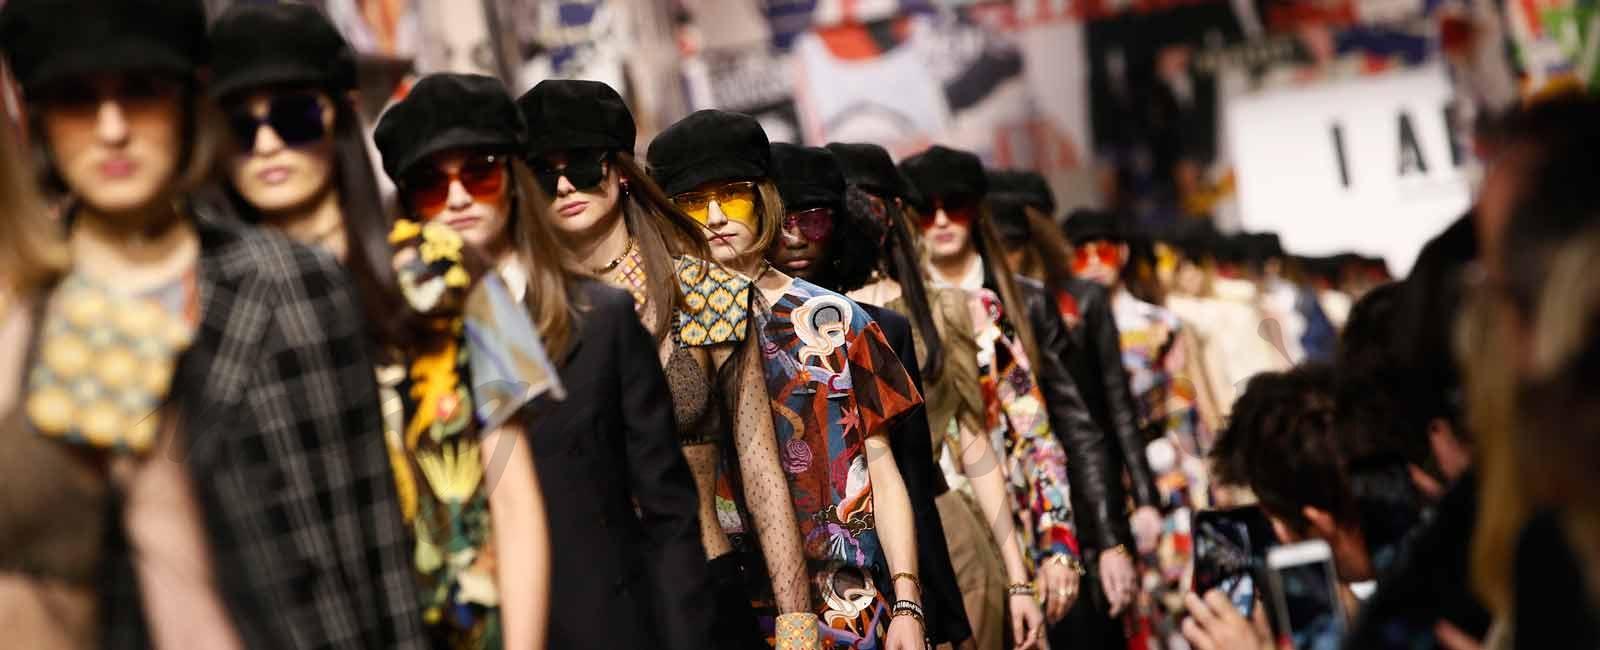 París Fashion Week: Christian Dior Otoño-Invierno 2018/2019